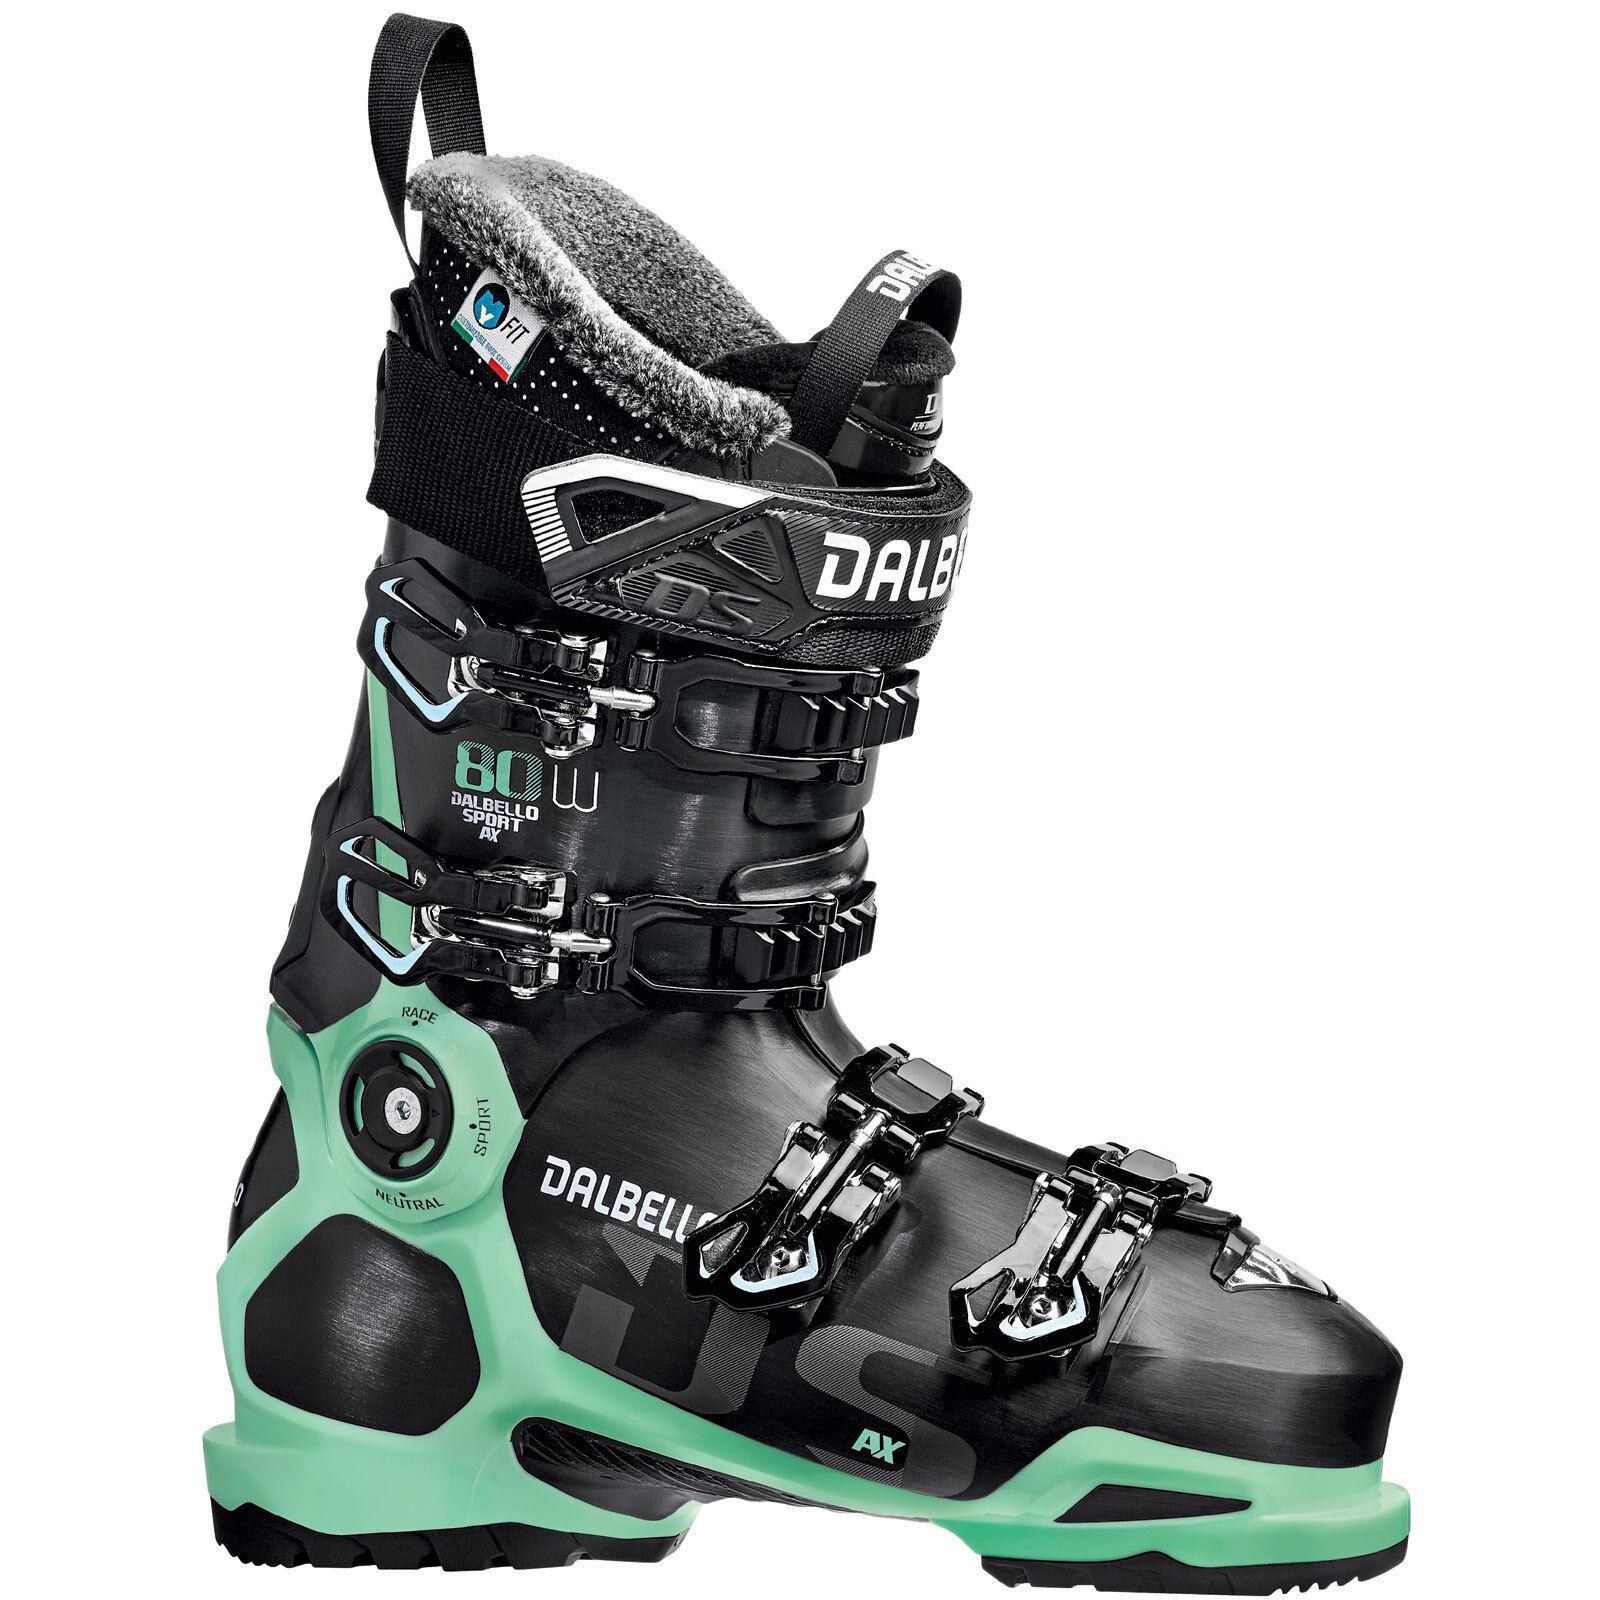 Dalbello Ds Hacha 80W Ls Damen -skischuhe -skischuhe Damen Alpin-Schuhe Ski-Stiefel ac1b4a